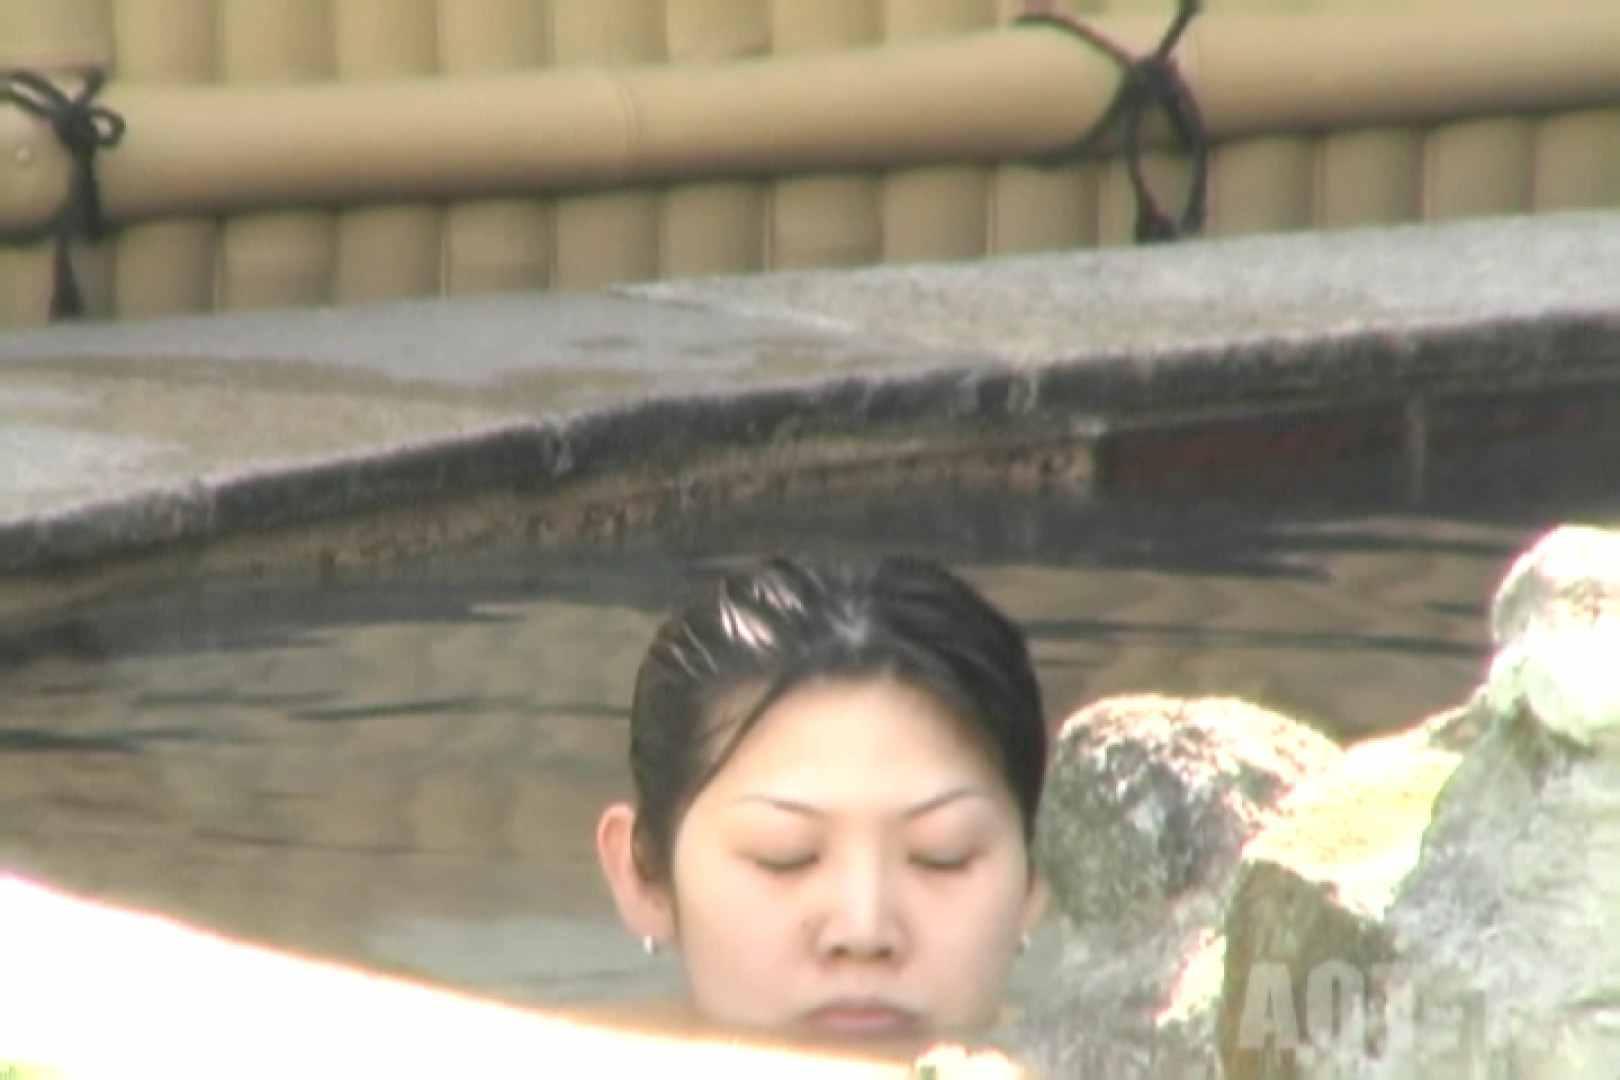 Aquaな露天風呂Vol.850 盗撮シリーズ | 露天風呂編  88PIX 5